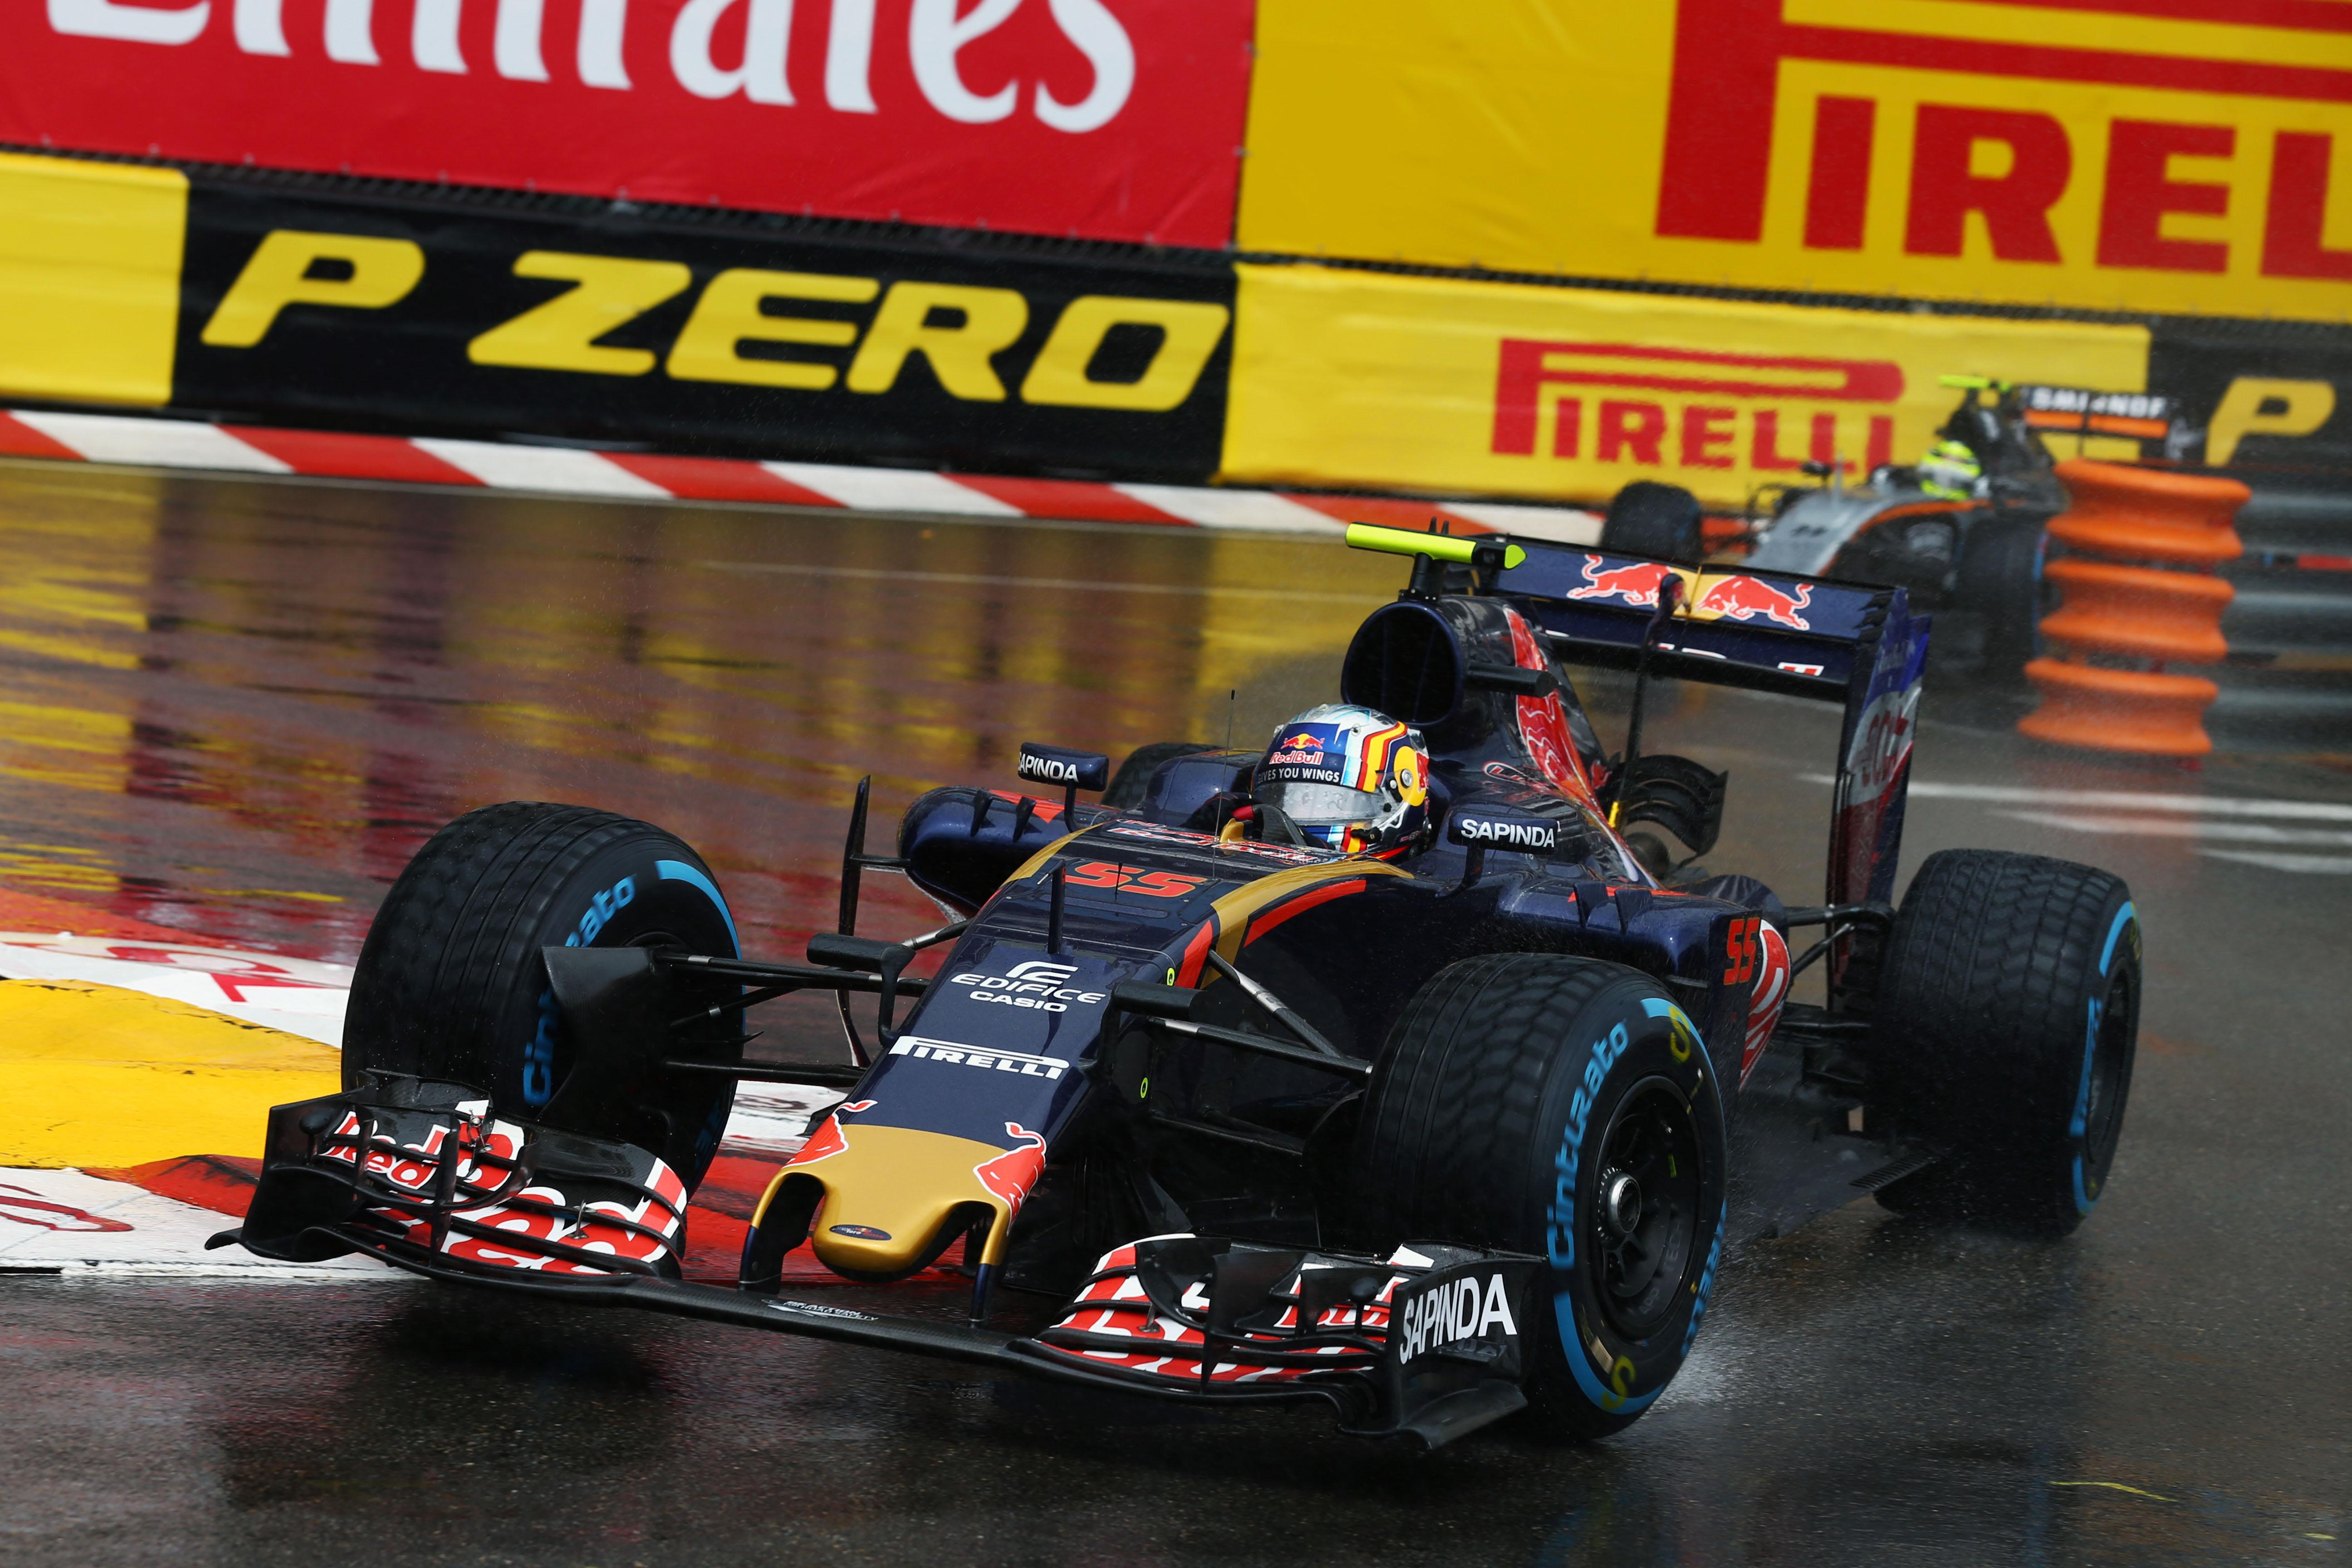 Carlos Sainz - Toro Rosso 2015